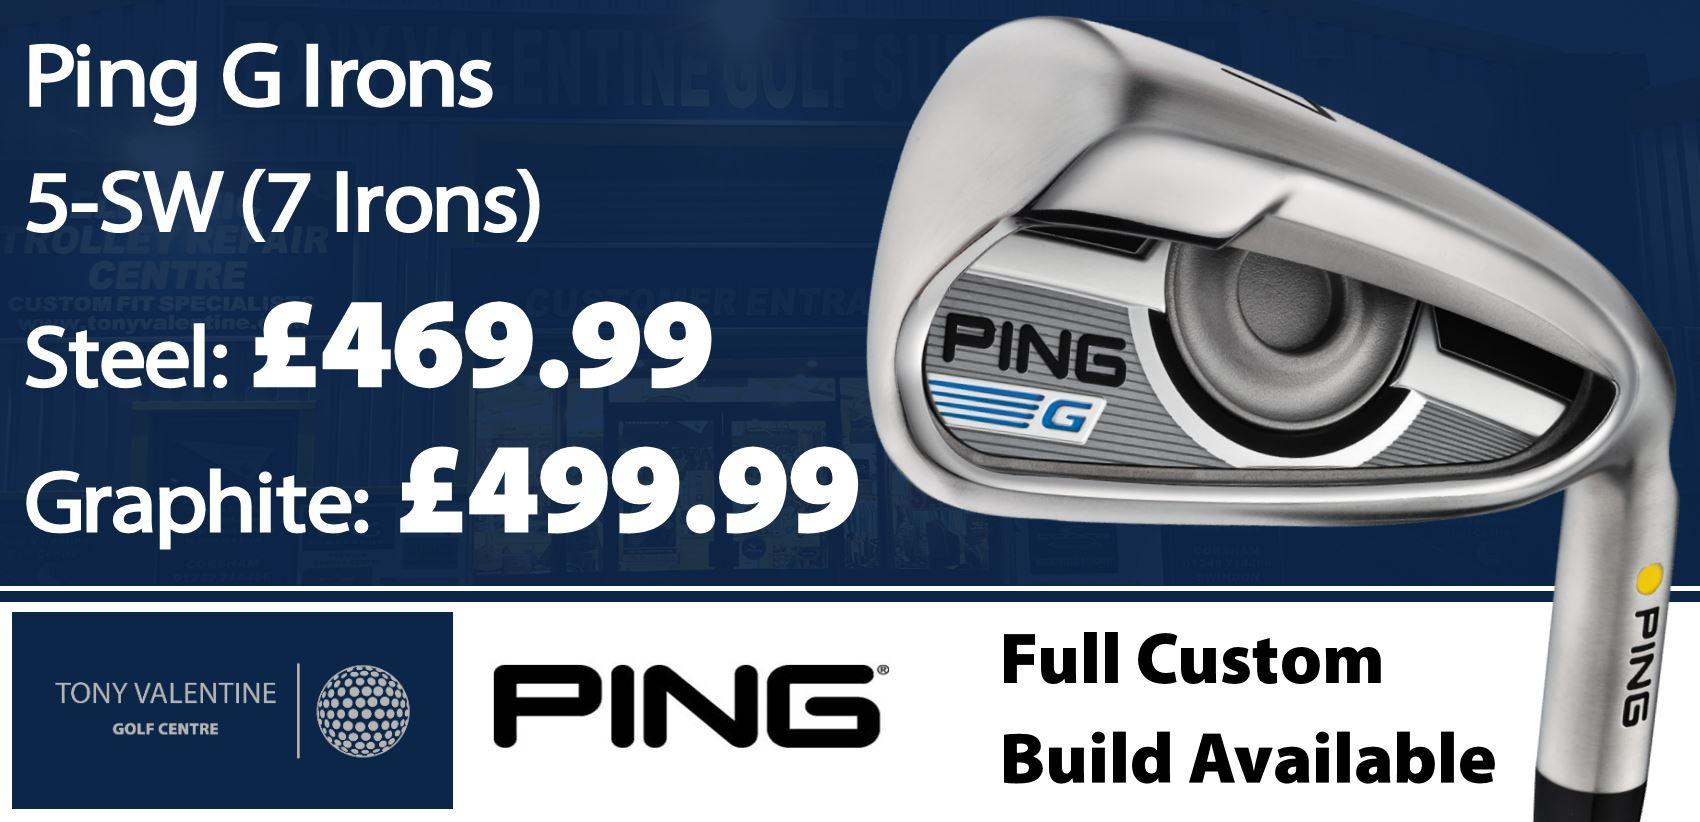 Ping G Irons - Custom Fit